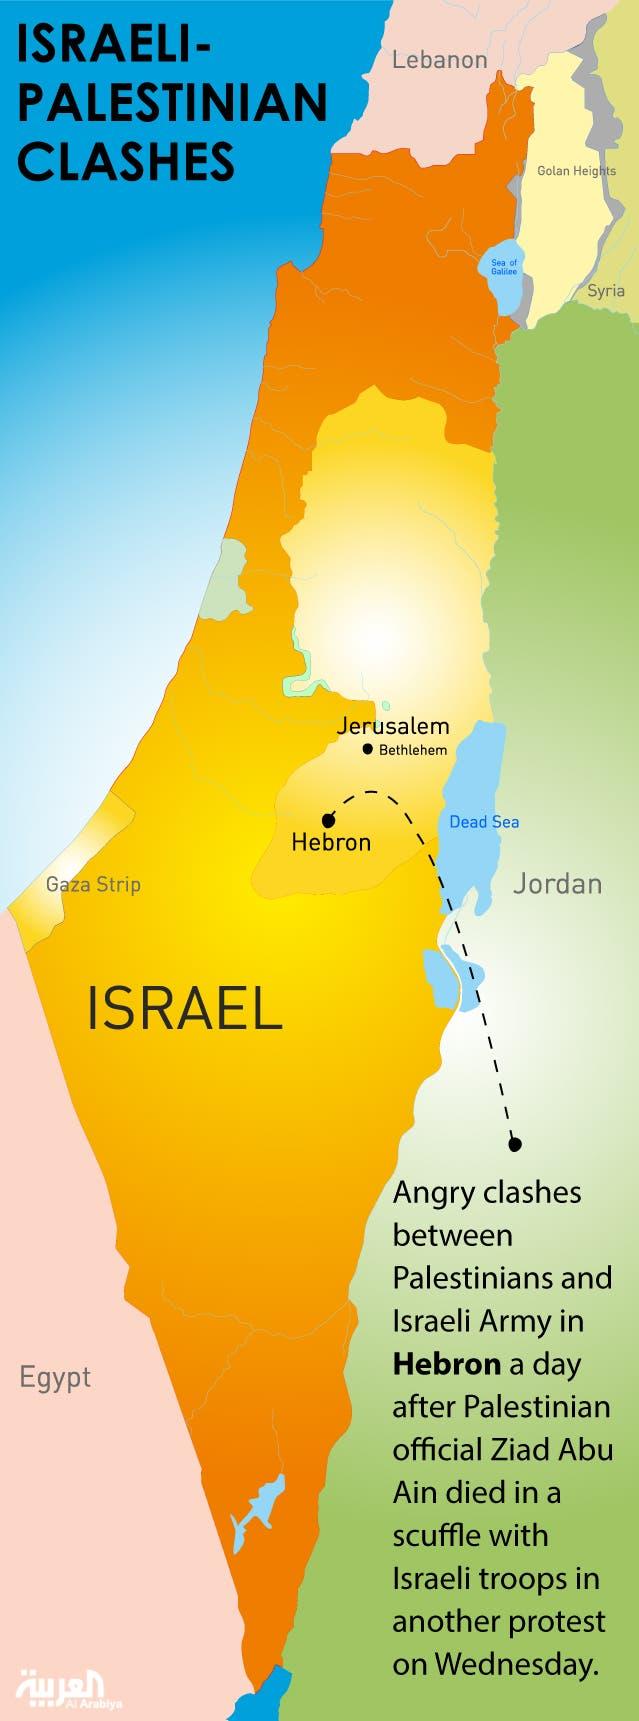 Infographic: Israeli-Palestinian clashes